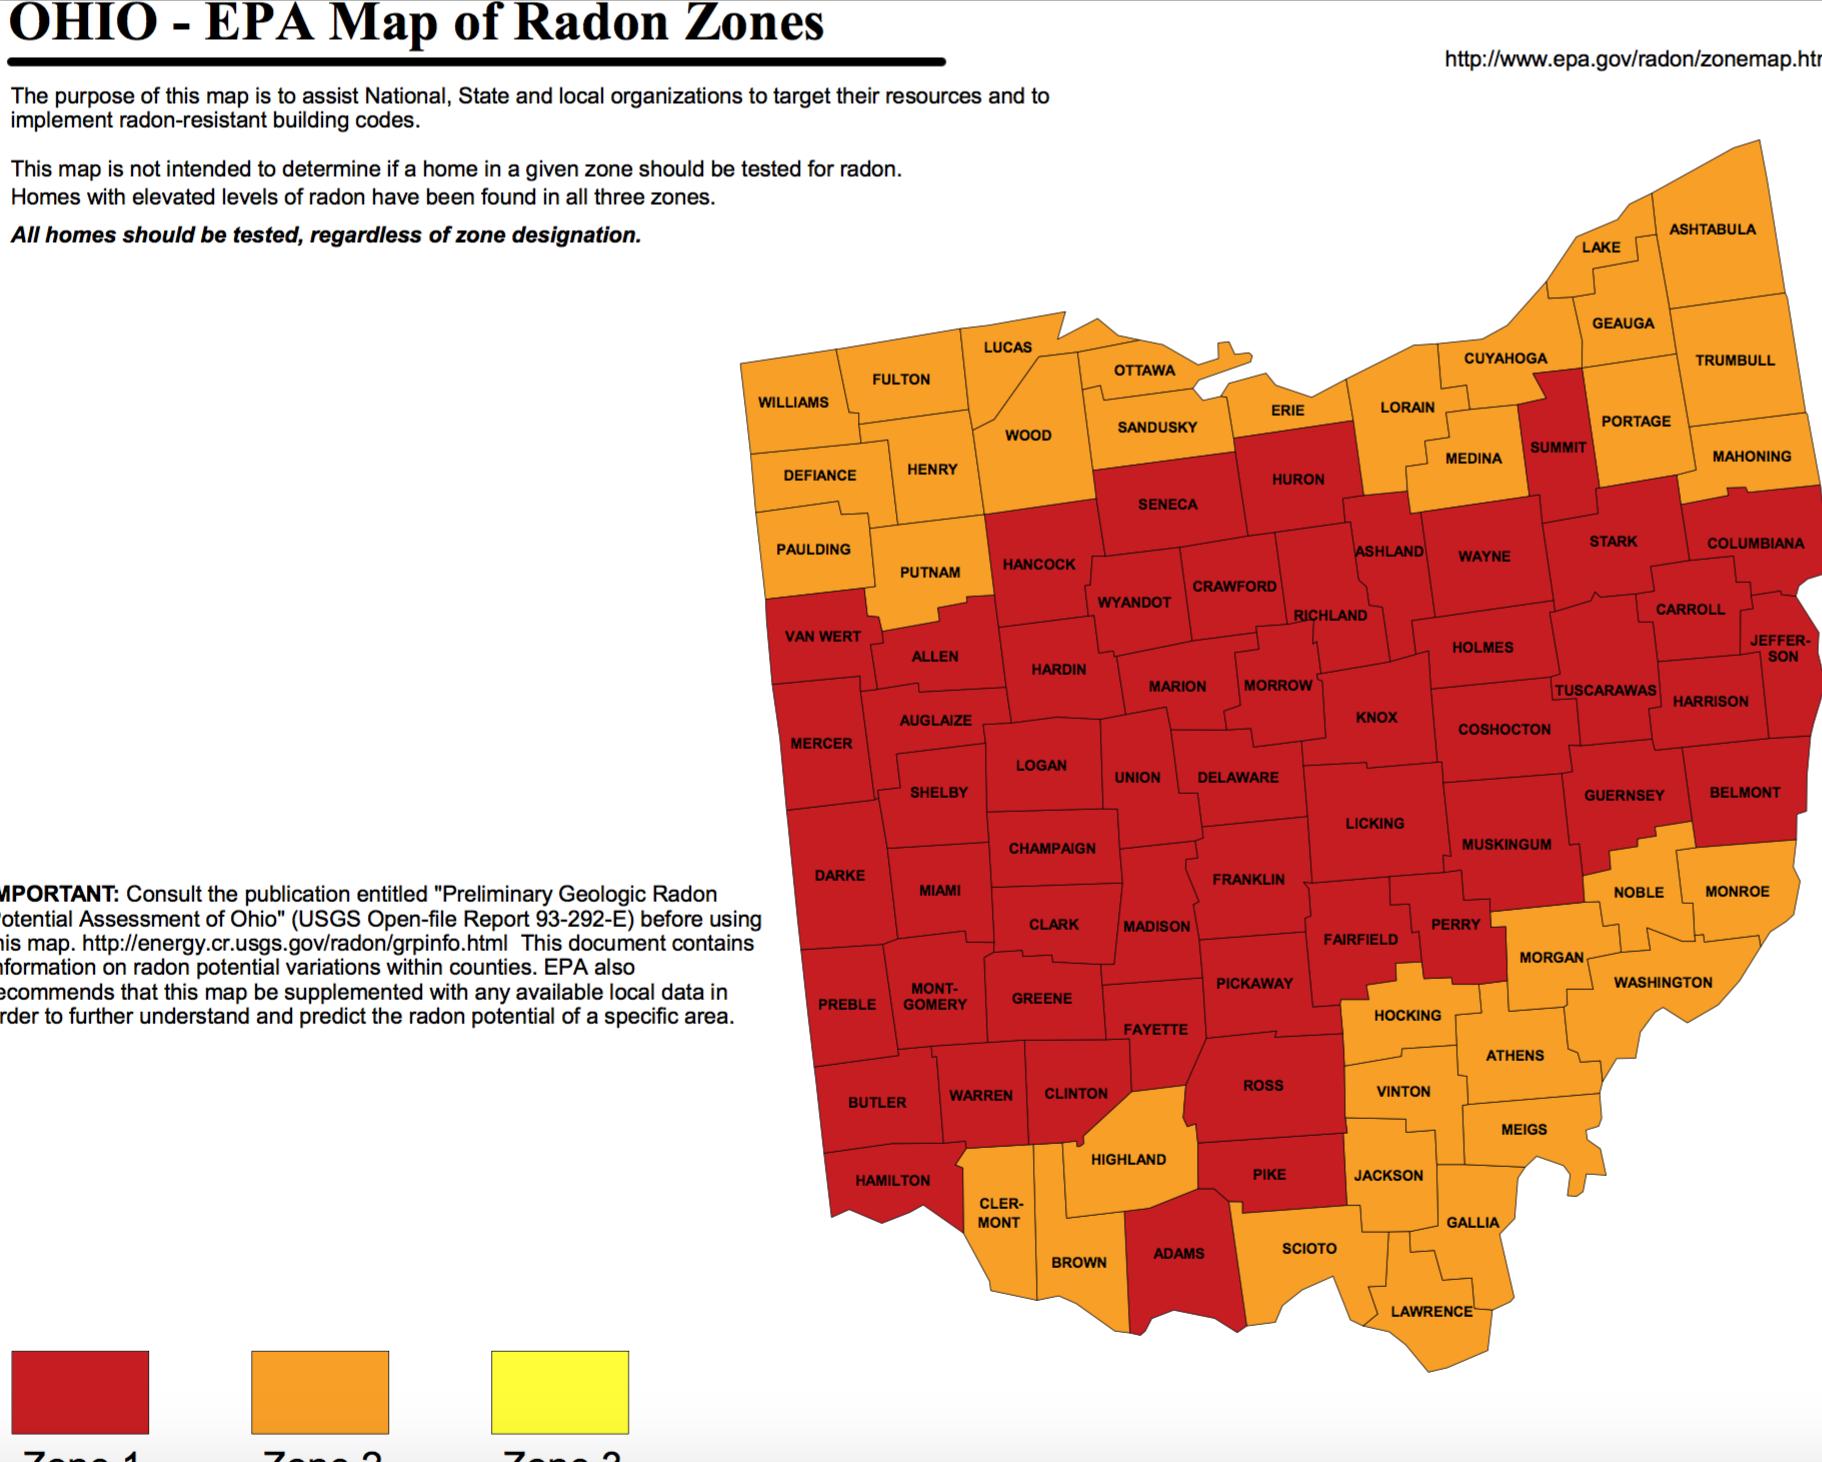 Why Does Ohio Have Such A Big Radon Problem